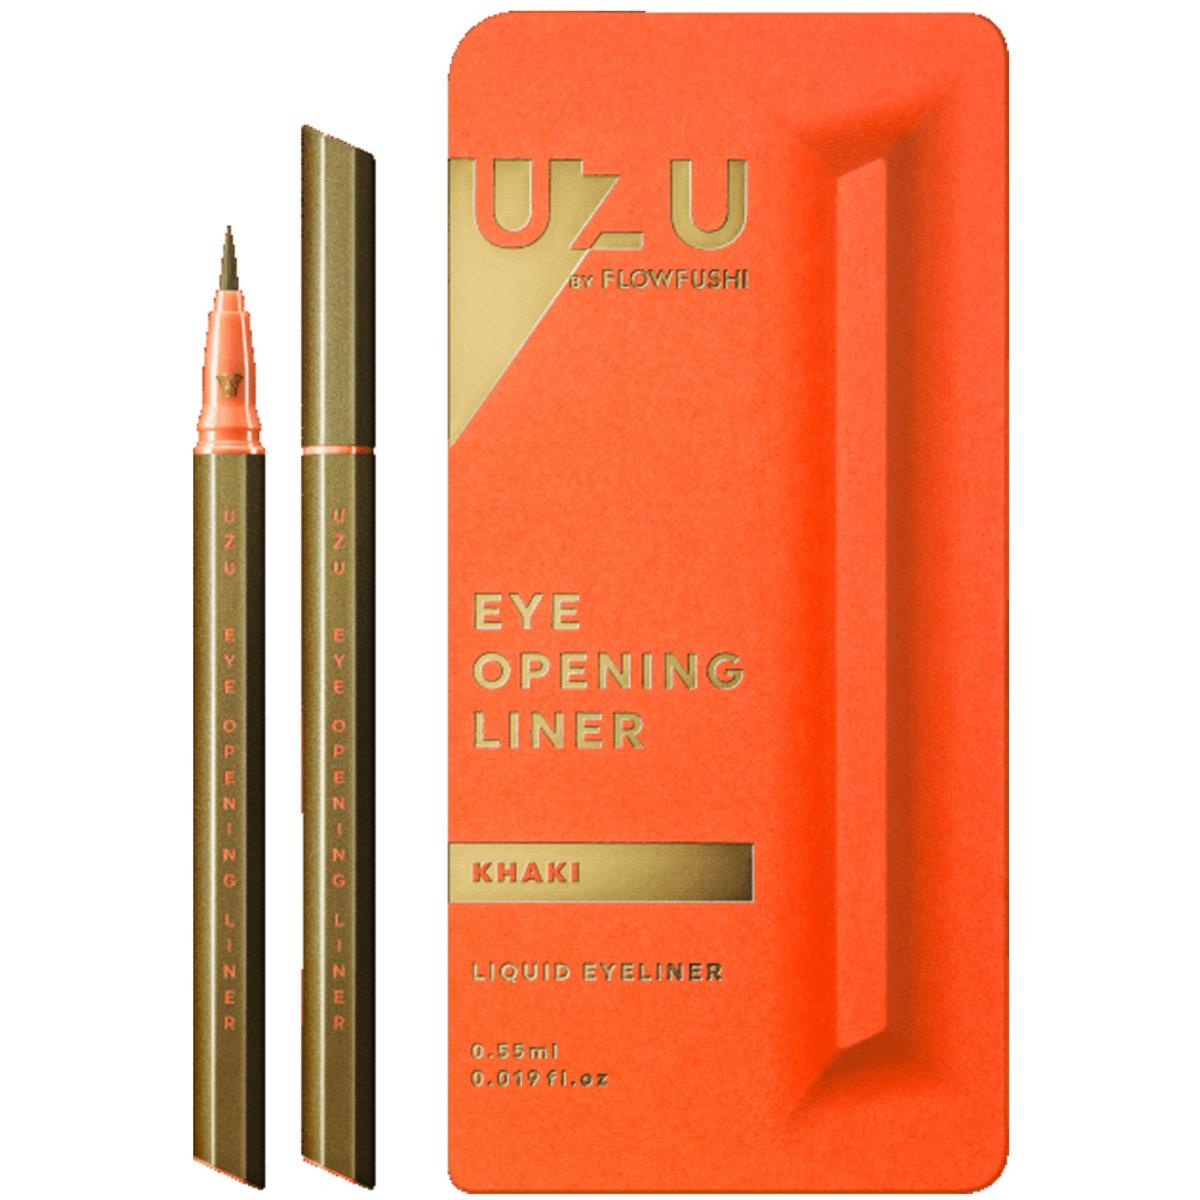 UZU Eye Opening Liner 0.55g (Khaki - Red Orange Box) (4571194364163)